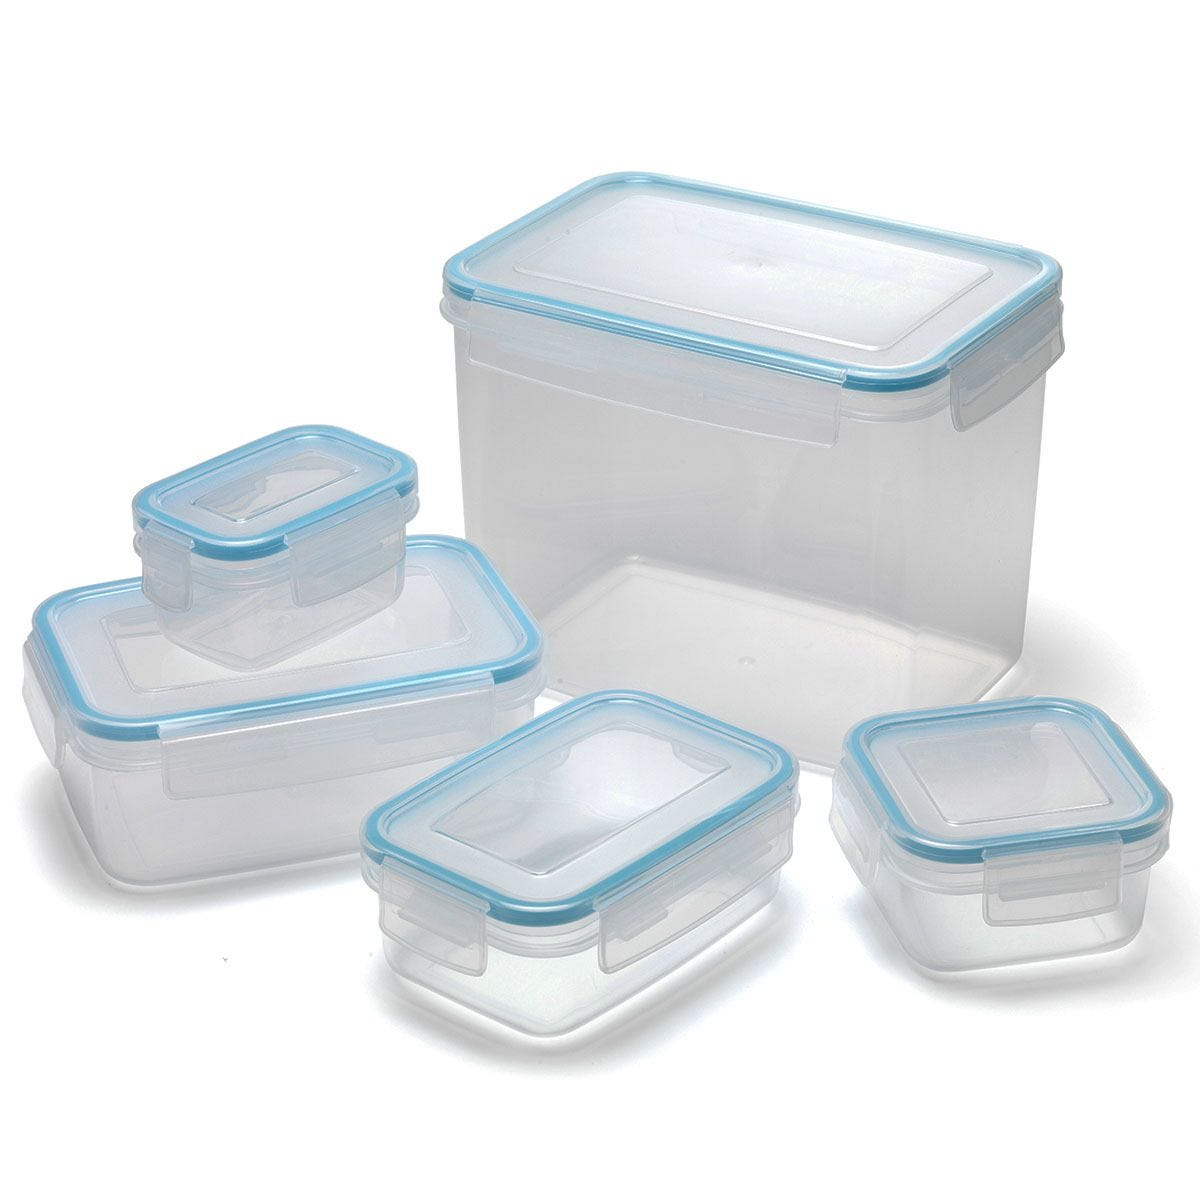 Addis Clip & Close 5-Piece Food Storage Set